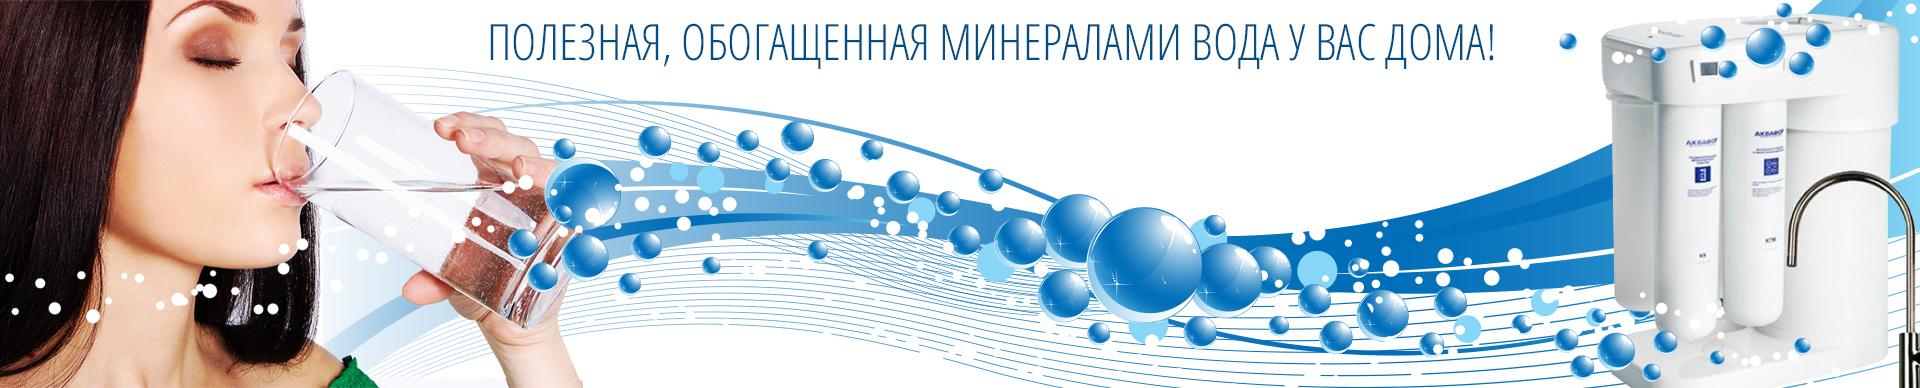 akvafor_slide_ru1